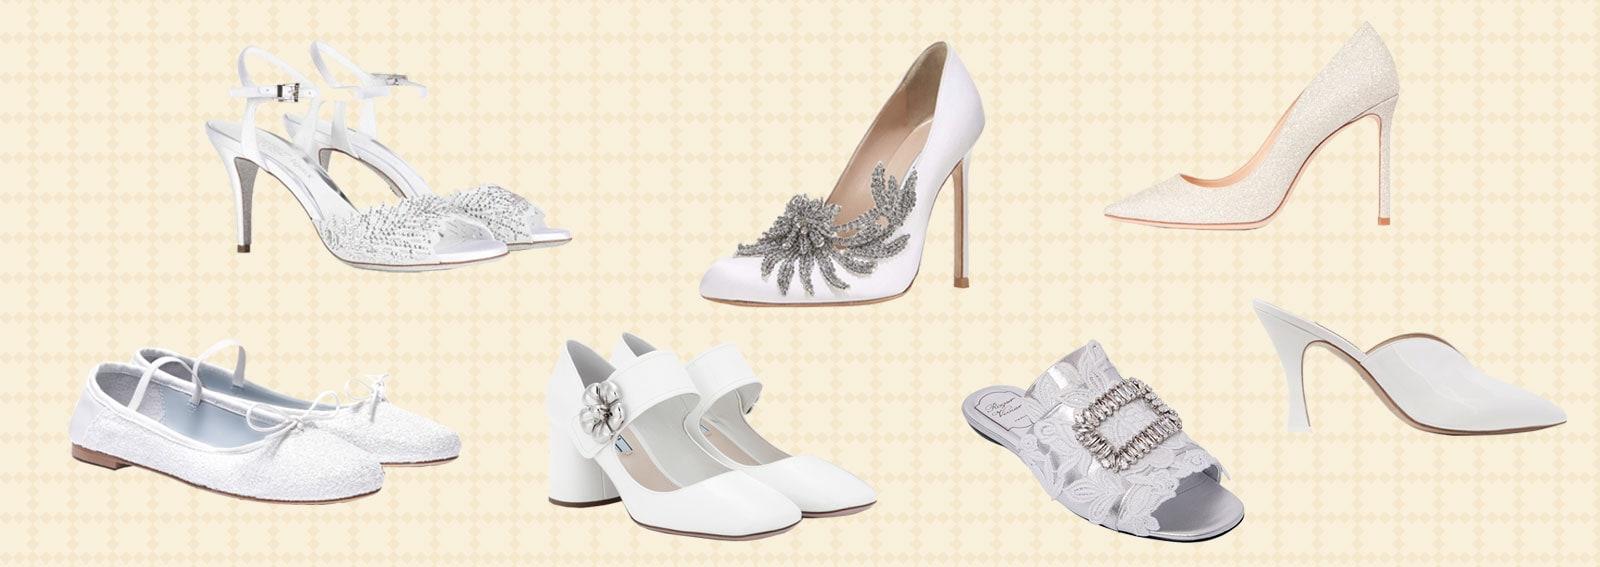 COVER scarpe sposa DESKTOP